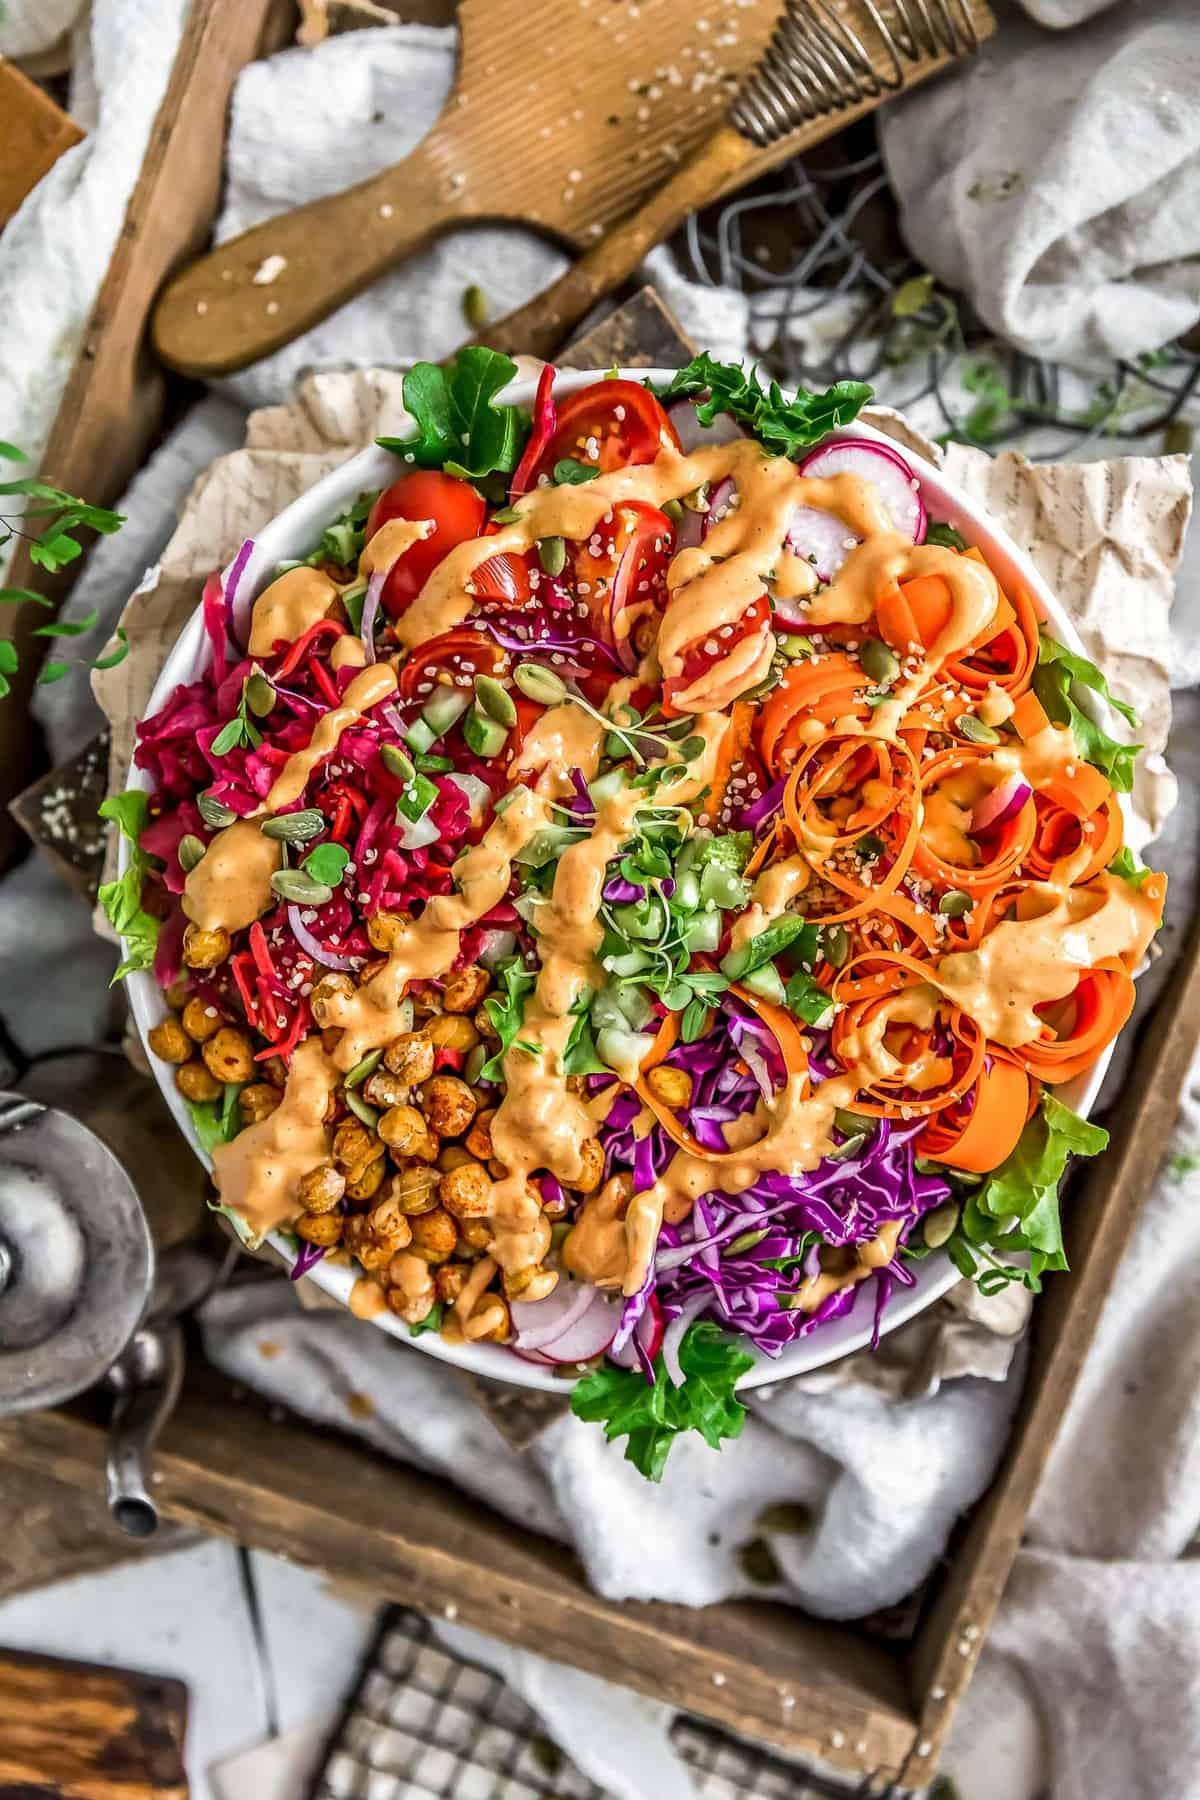 Veggie bowl topped with Oil Free Vegan Thousand Island Dressing